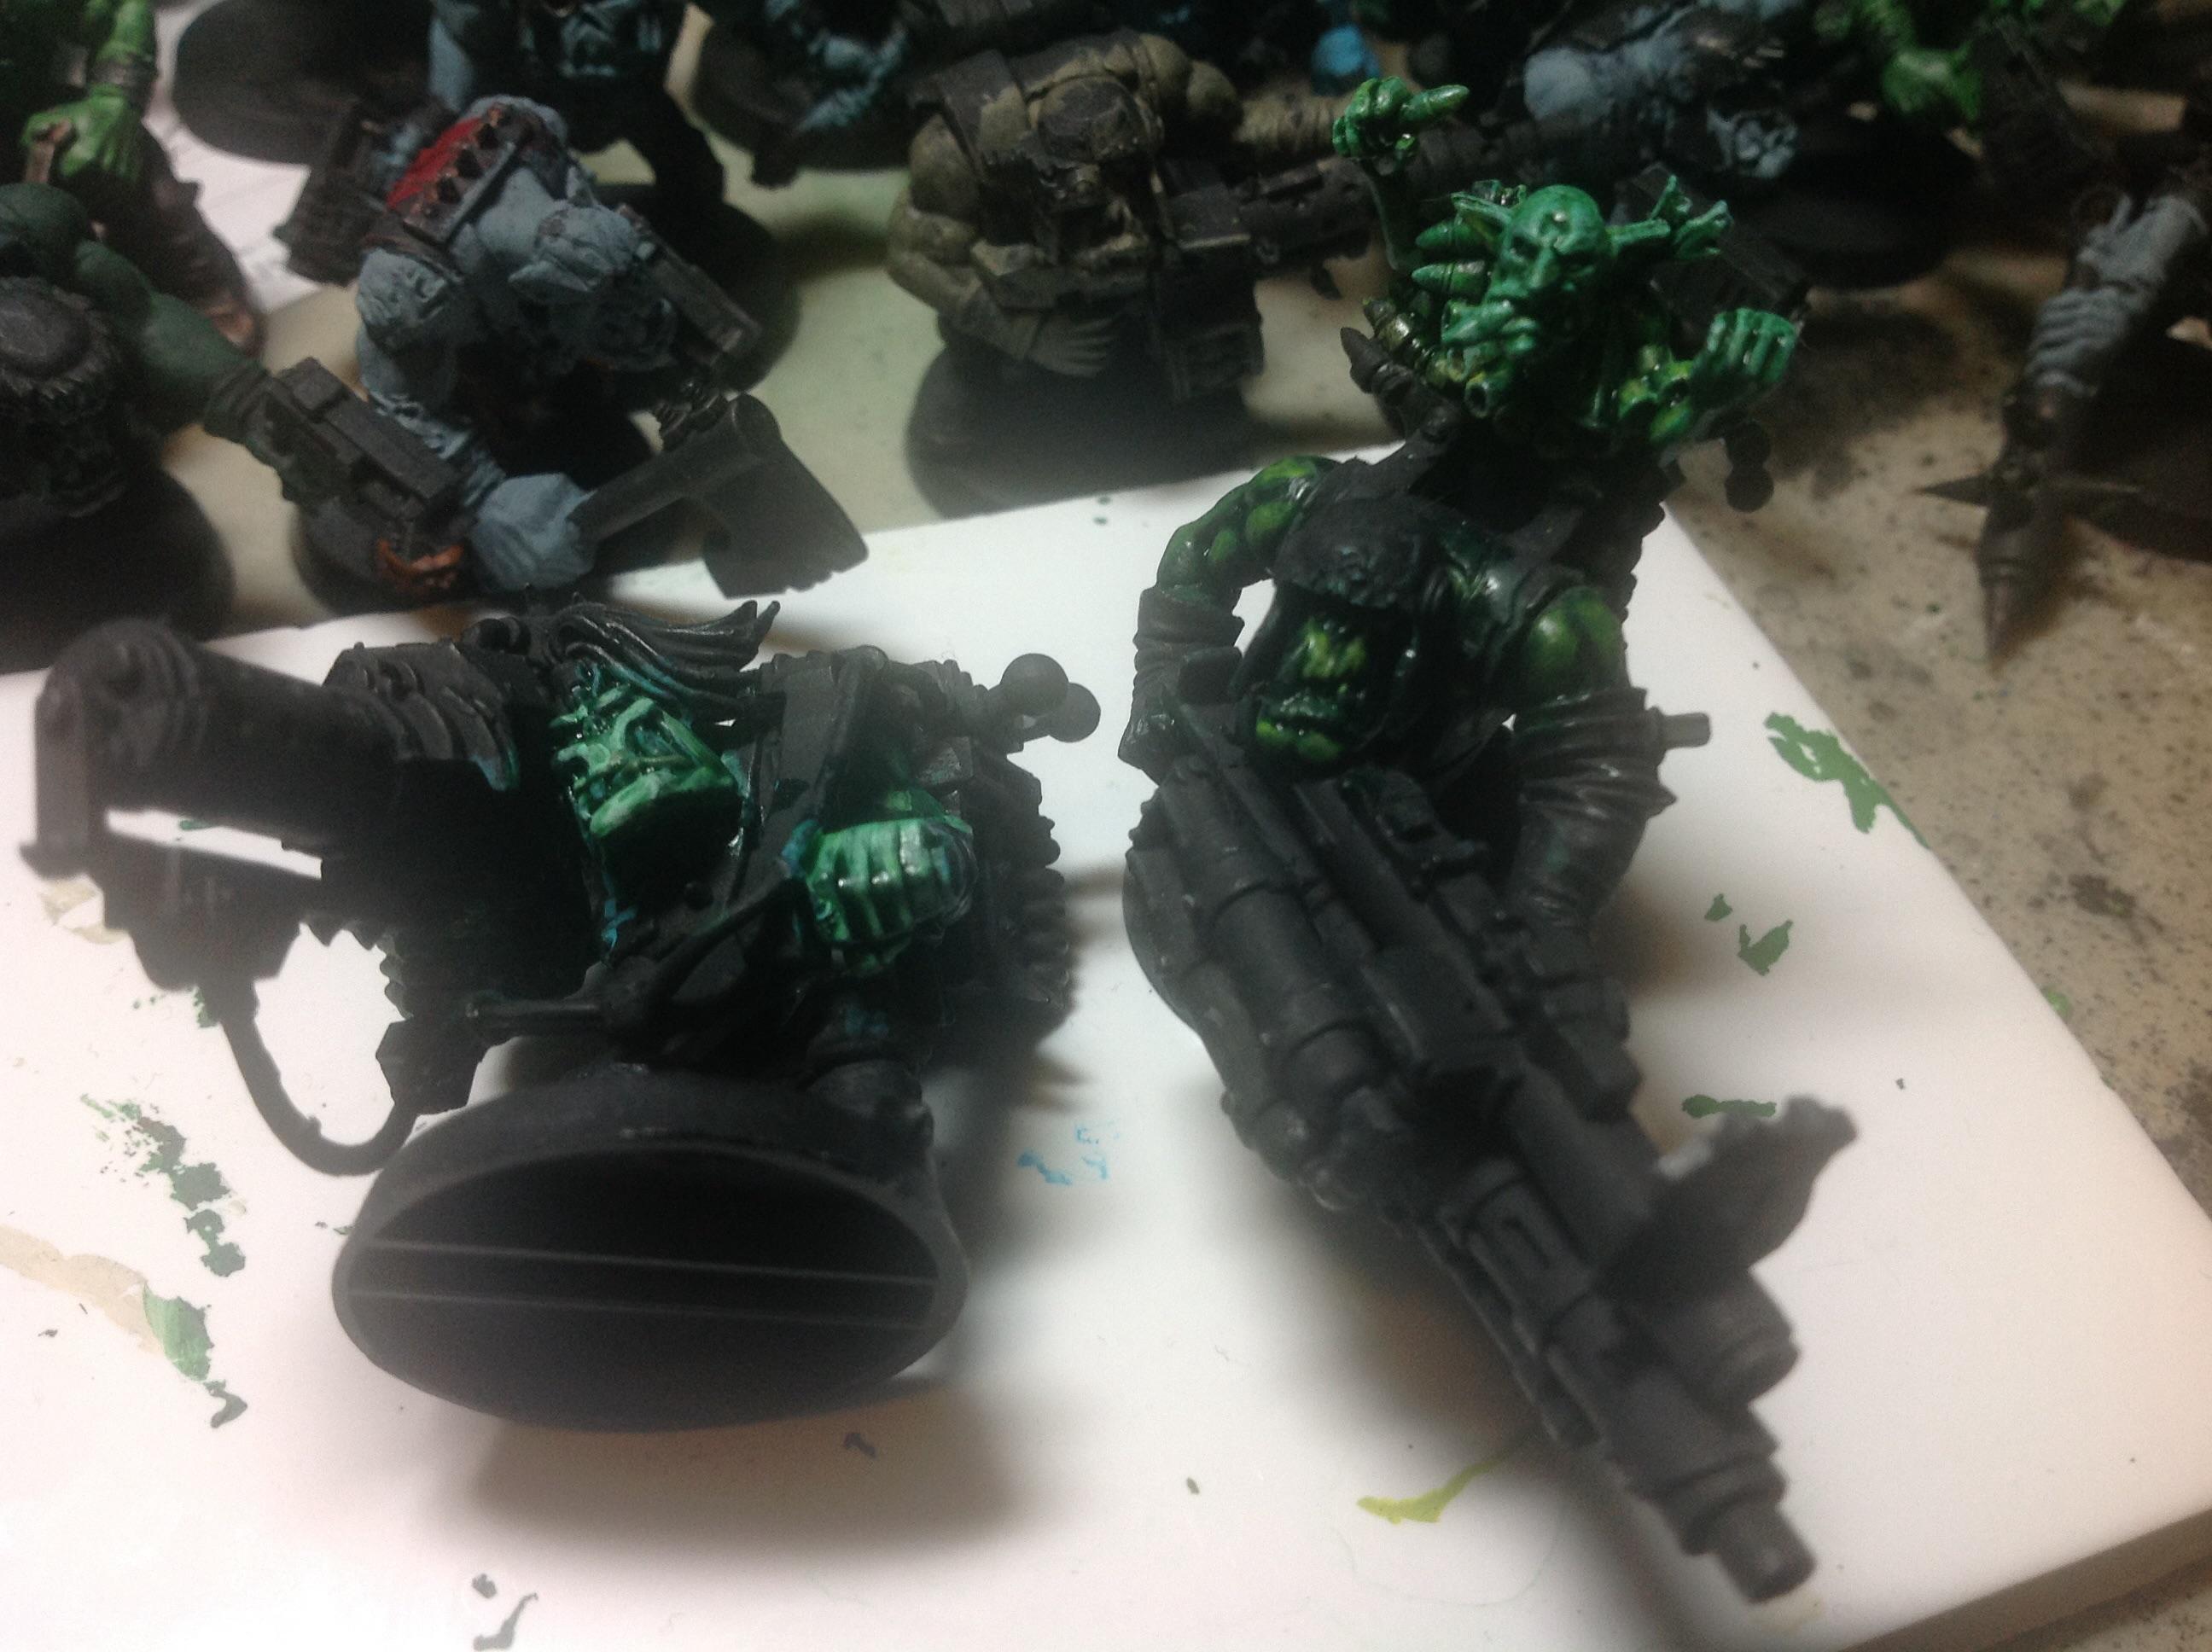 Batch, Boy, Green, Orks, Pip, Skin, Waaazag, Warboss_waaazag, Warhammer 40,000, Warhammer Fantasy